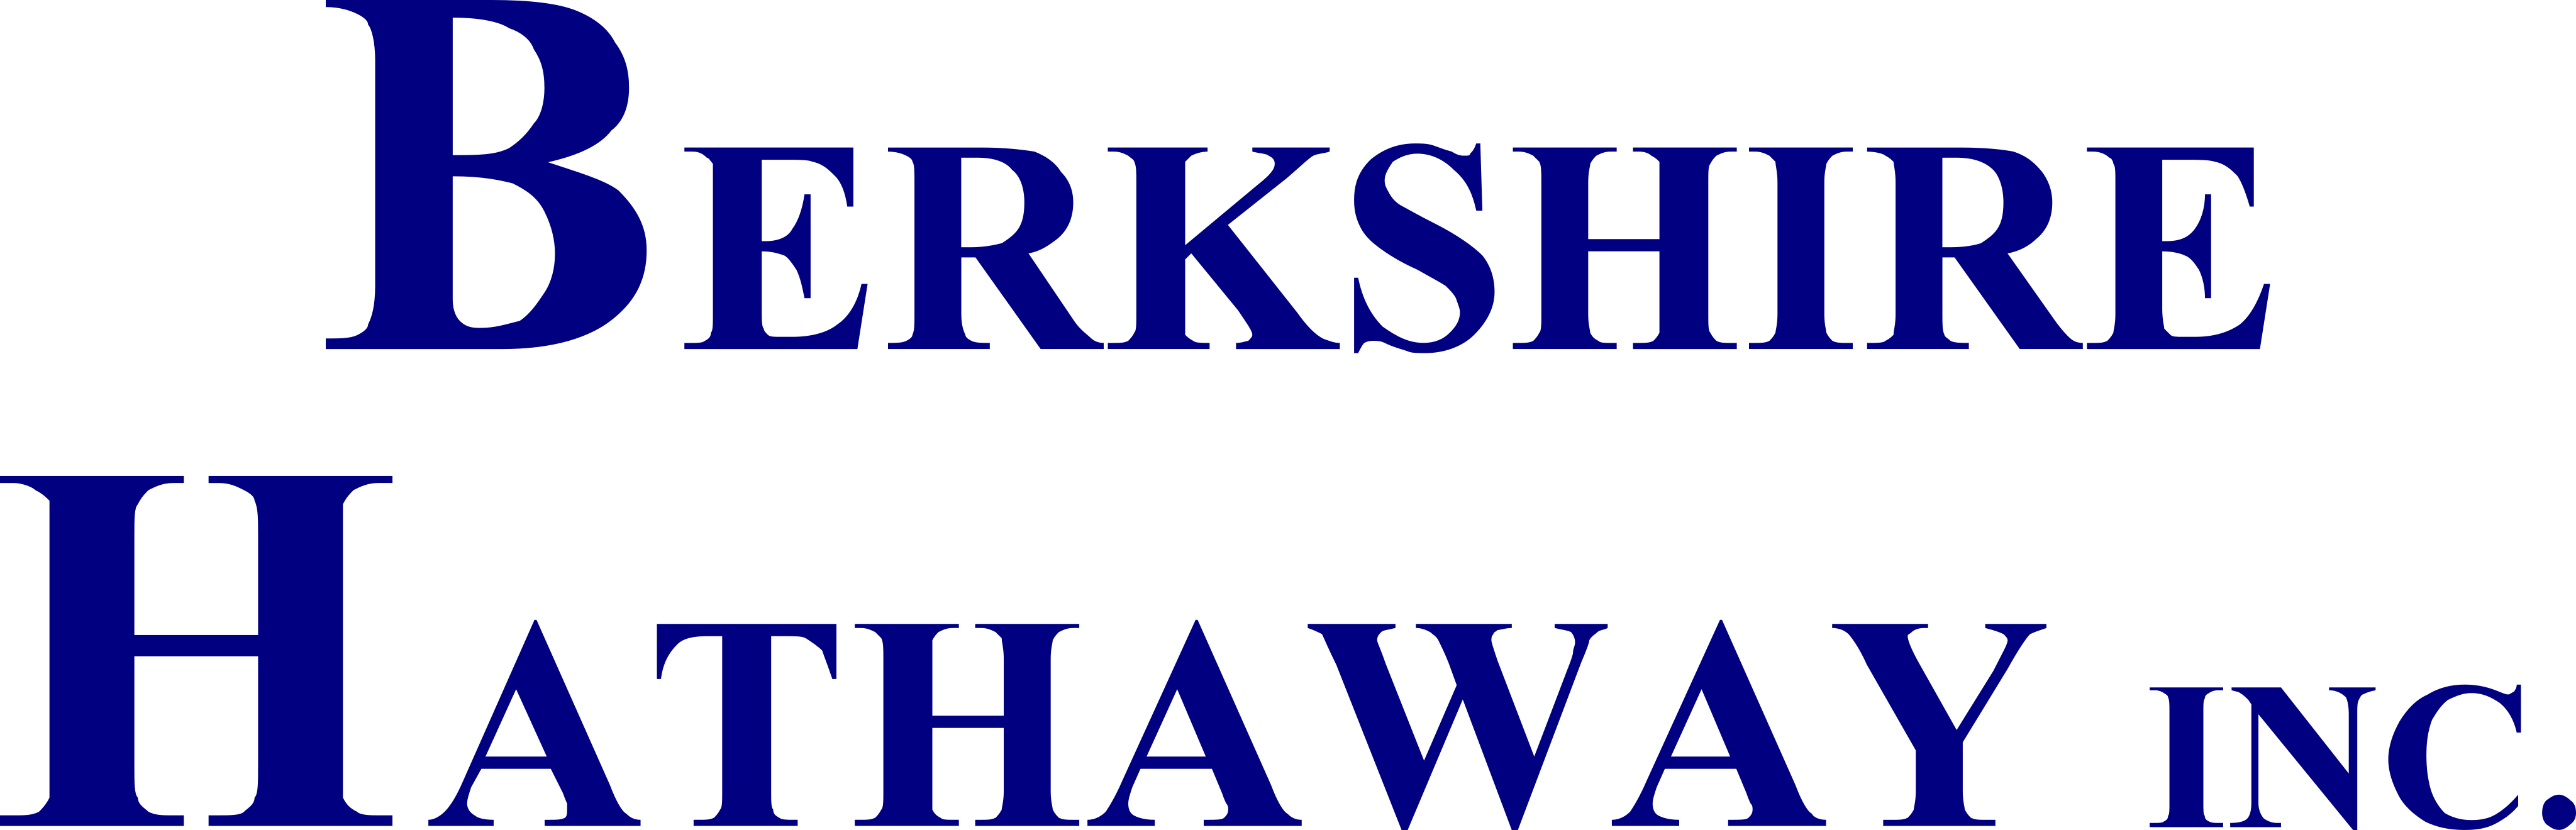 Berkshire Hathaway Inc_Isologotype